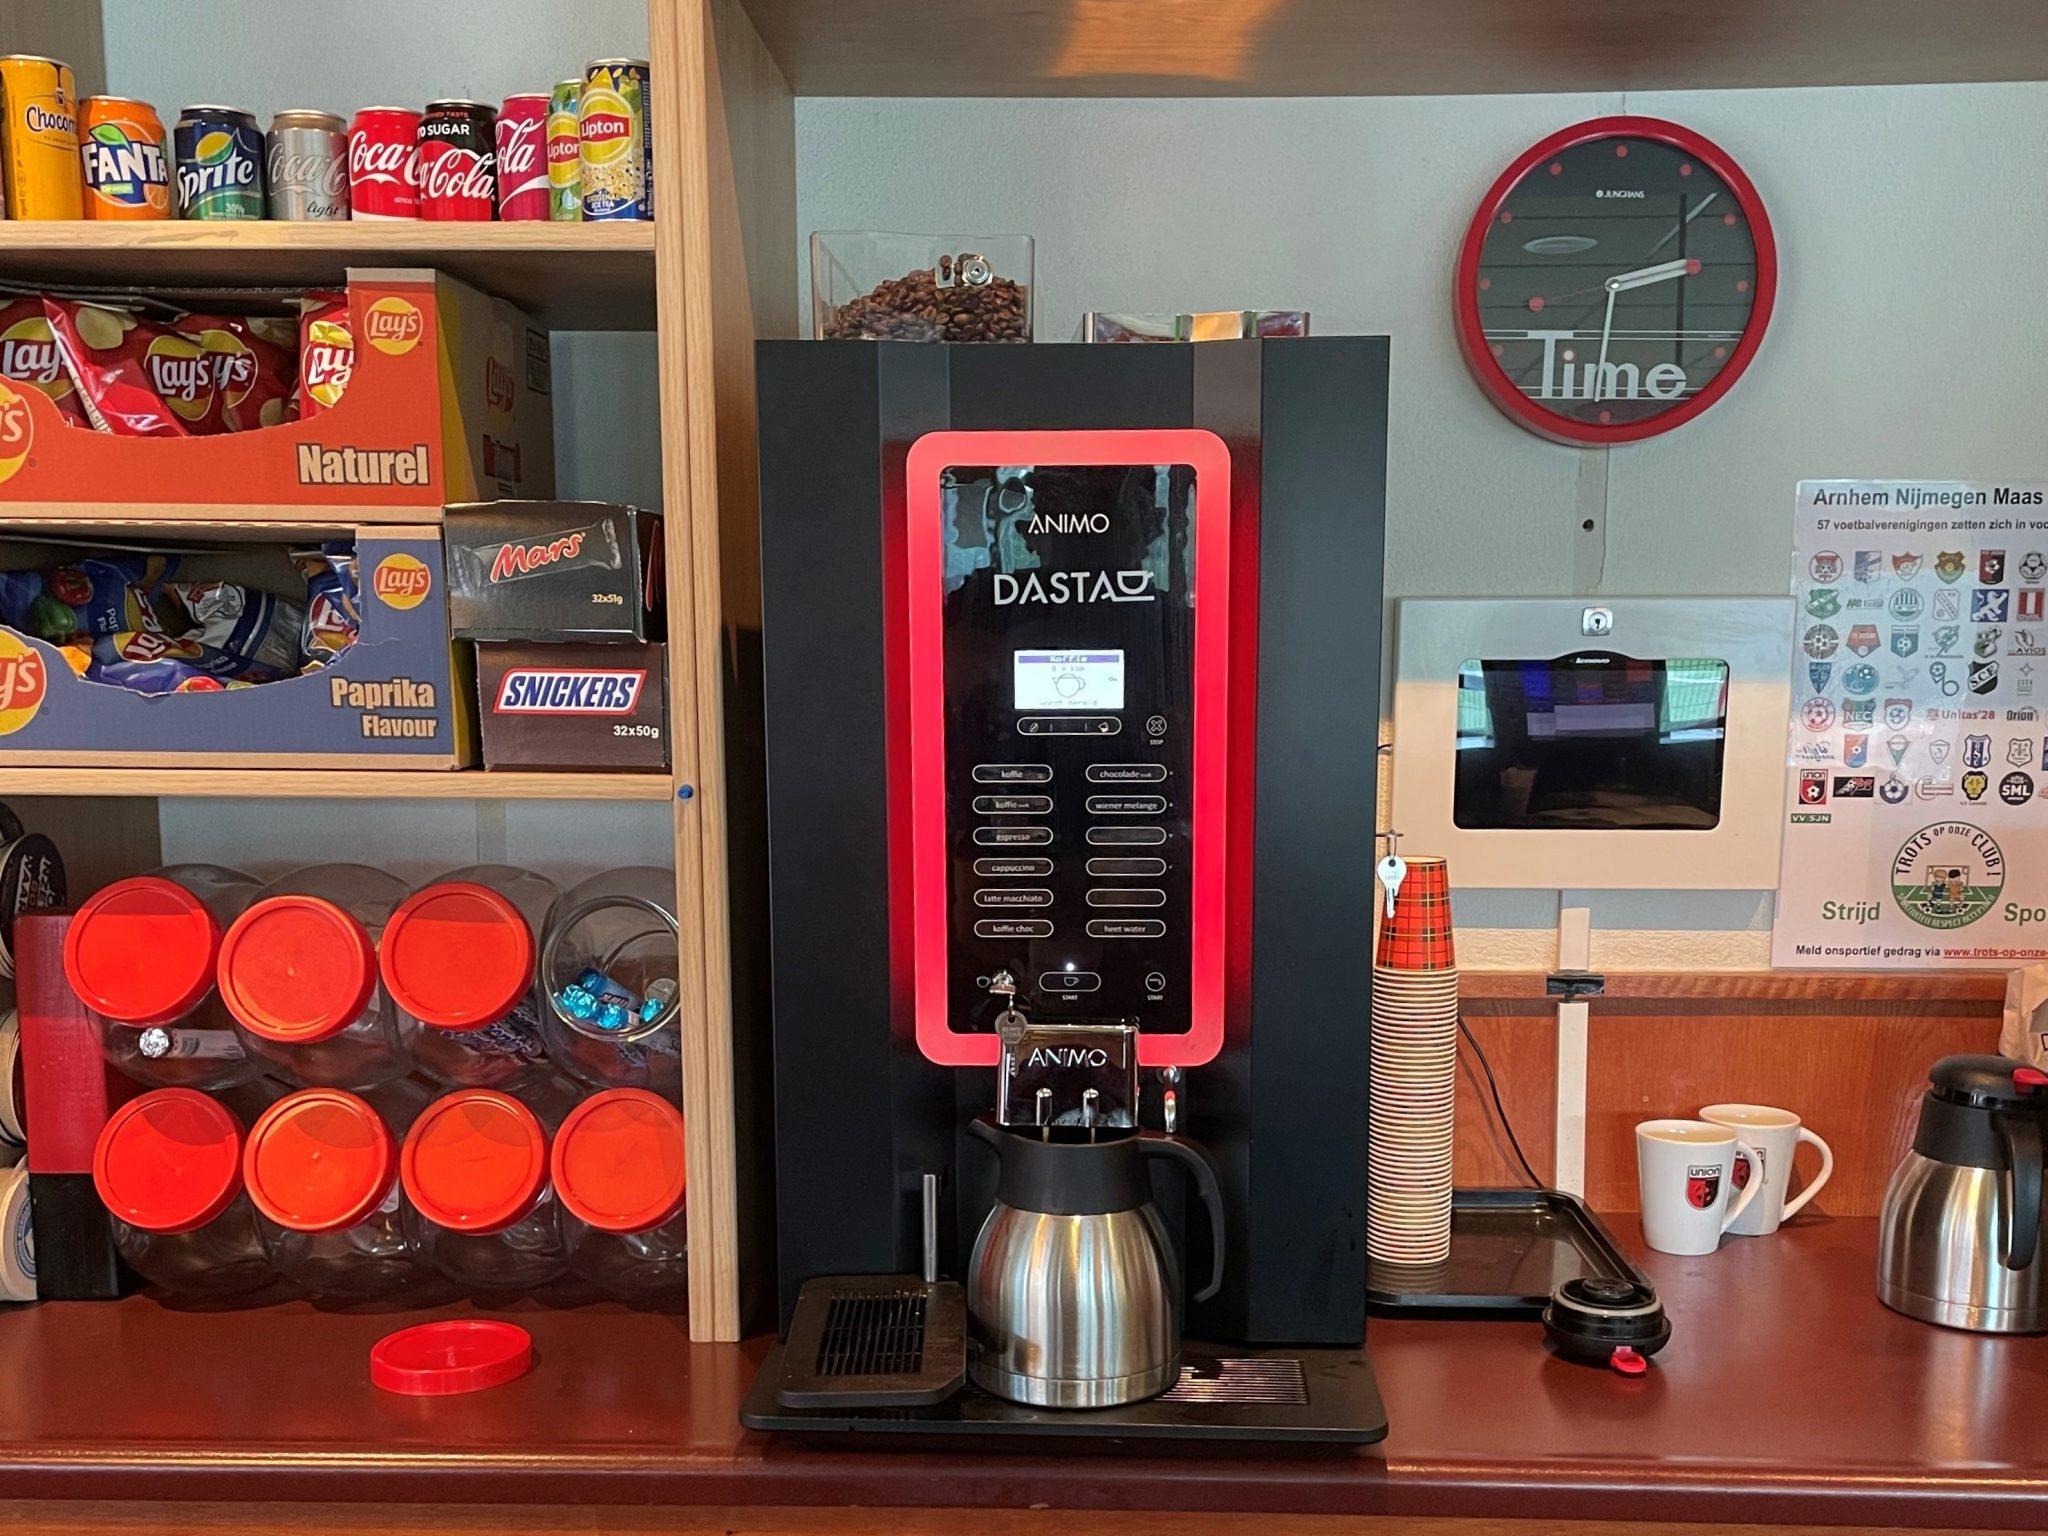 Lekkere koffie met dank aan Dasta